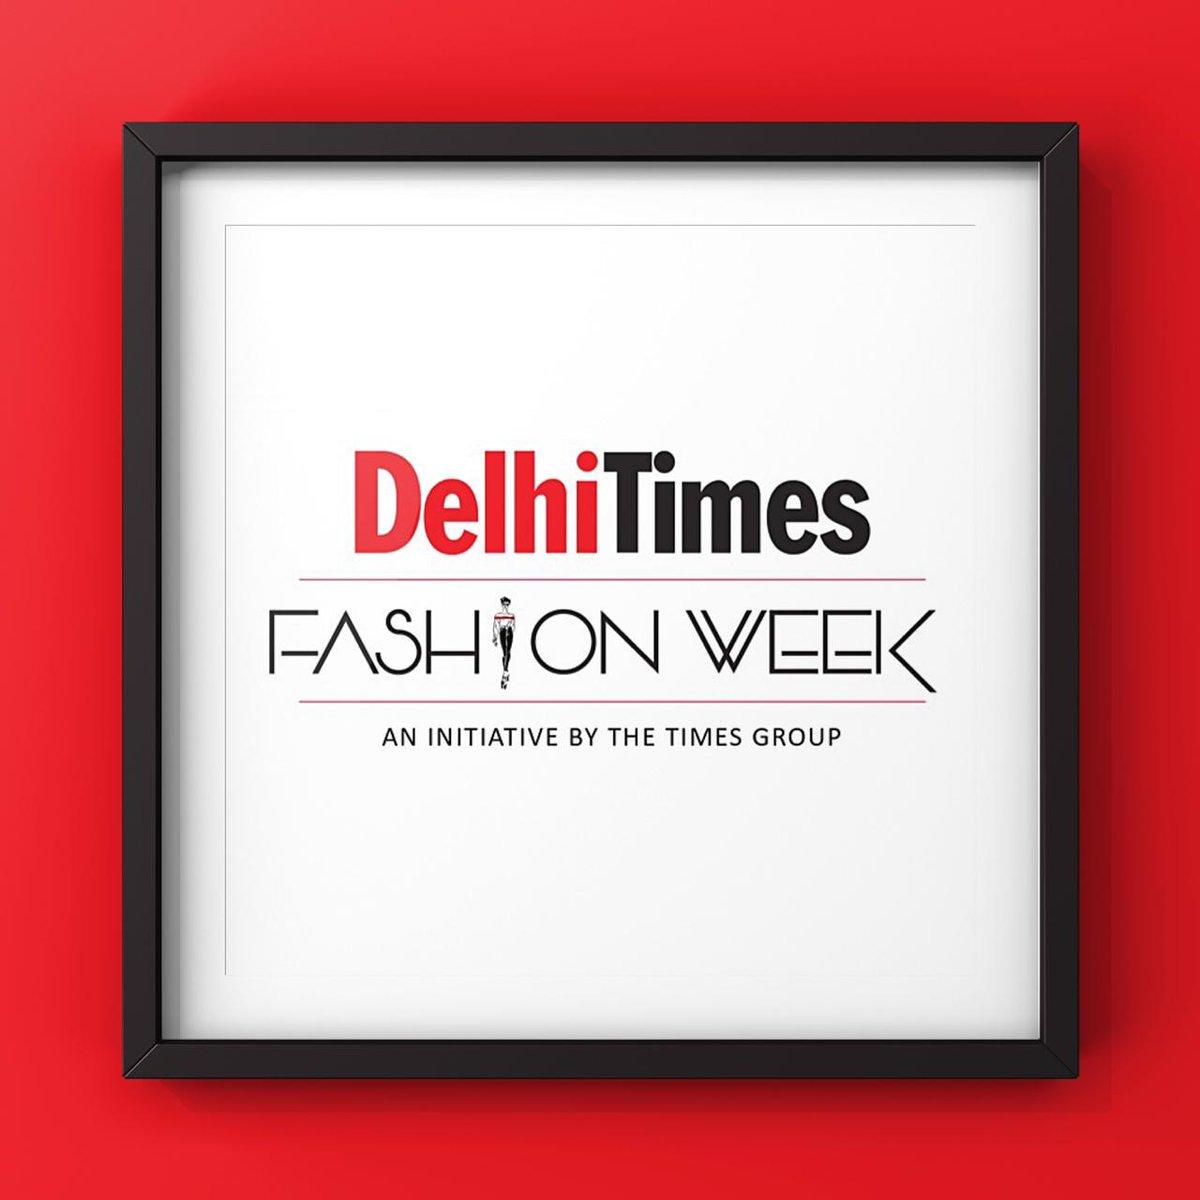 Logo Design for Delhi Times Fashion Week. An exclusive property of the Times of India. #logo #logodesigner #logodesigns #logos #design #agency #marketingdigital #branding #logoawesome #zzap #zzapdigitalagency #brandingdesign #brandingagency #delhitimes #fashionweek #fashiongram https://t.co/xmrblMLloP